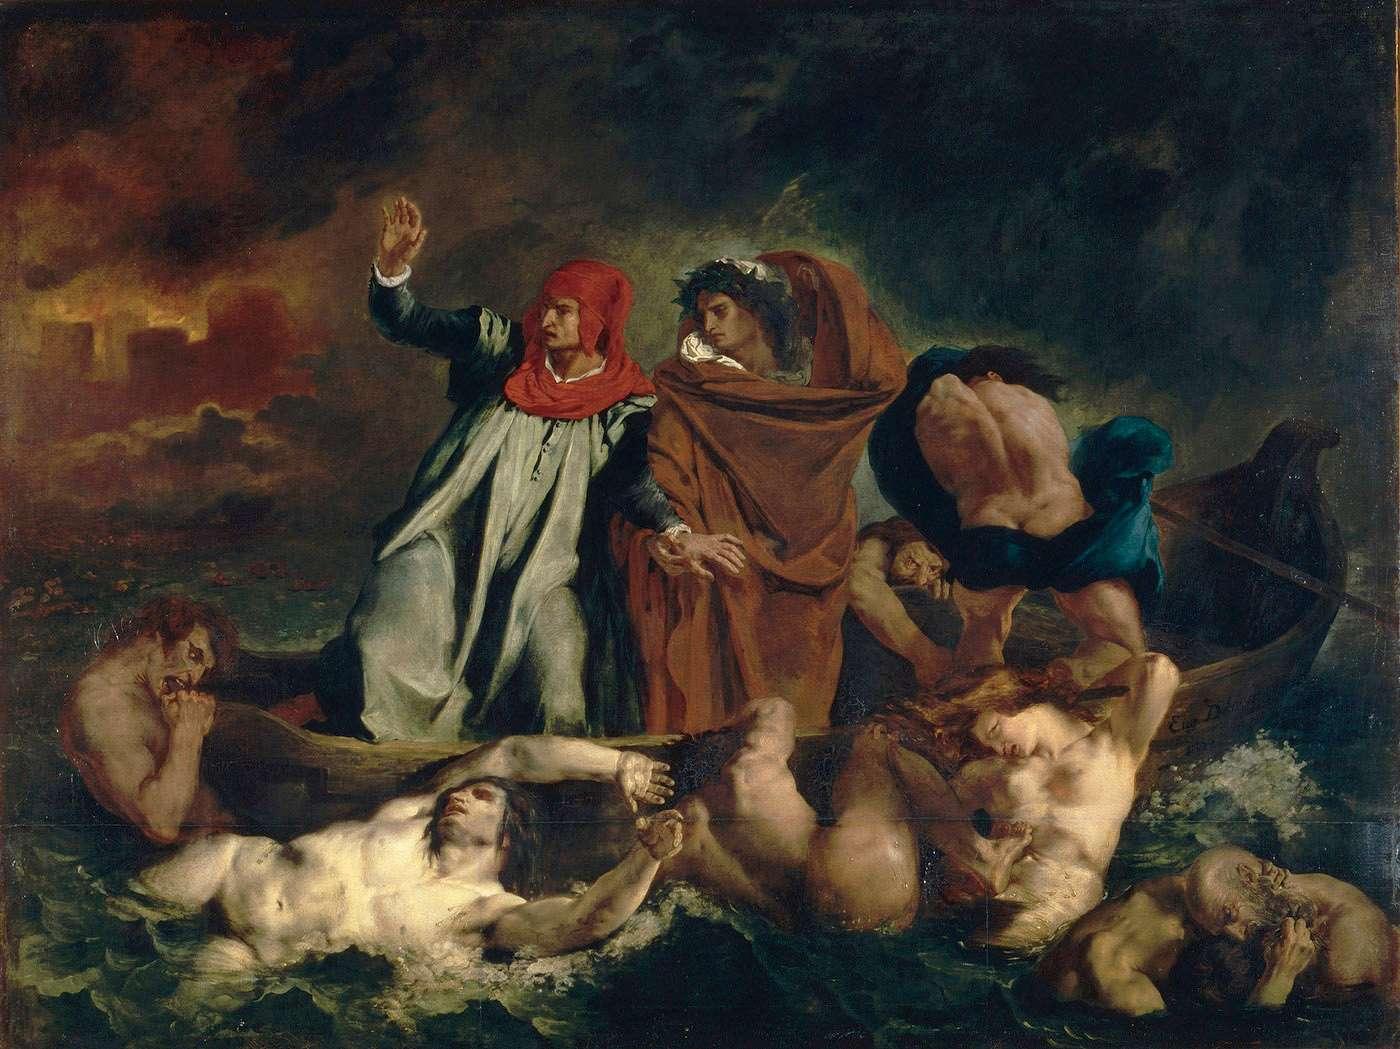 Plik:La Barque de Dante (Delacroix 3820).jpg – Wikipedia, wolna encyklopedia